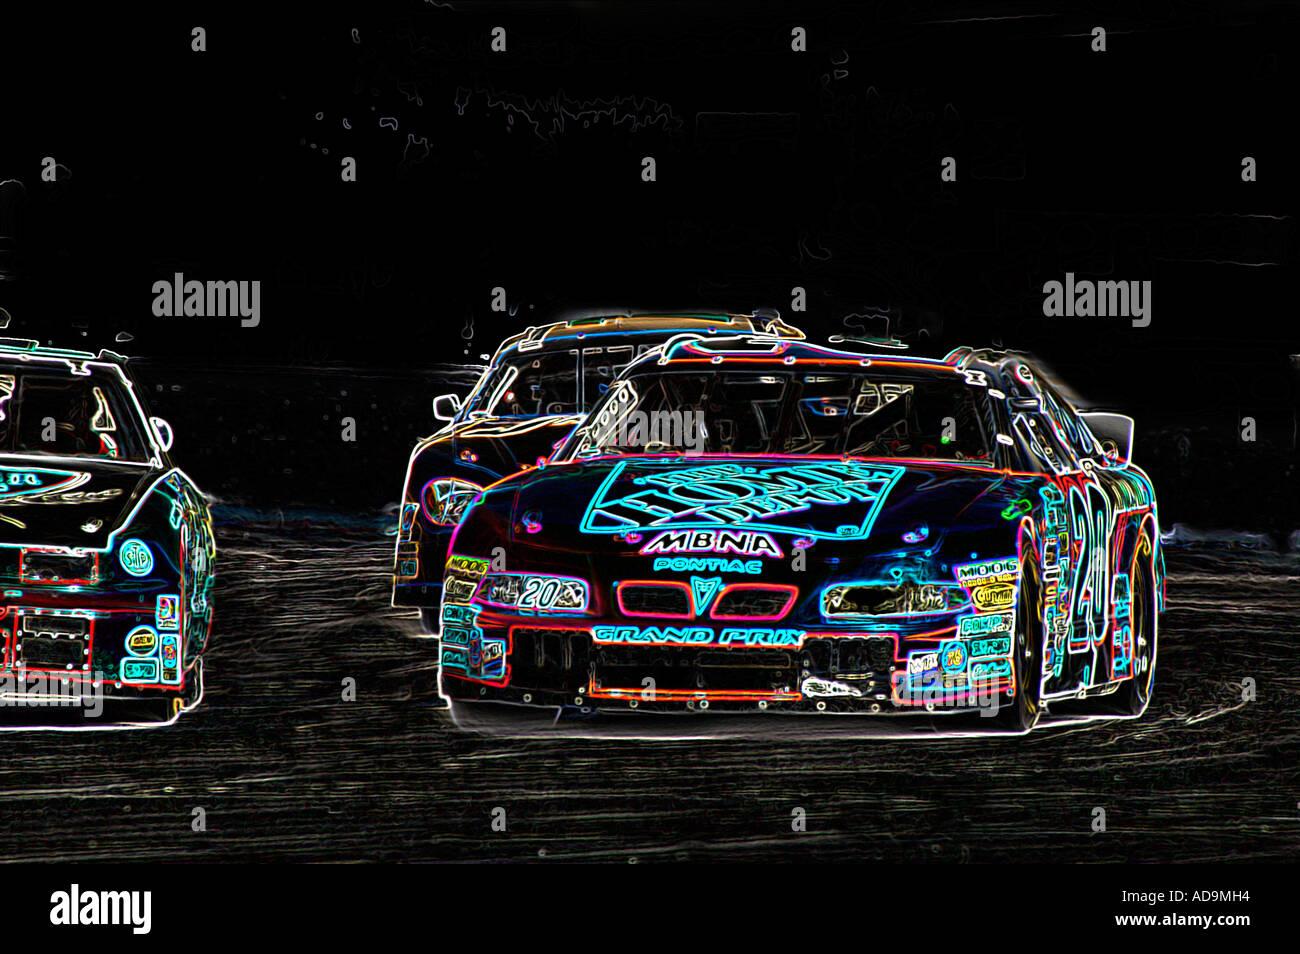 Computed Generated Abstract Art Of Nascar Stock Cars At The Historic Sportscar  Races At Sebring Internation Raceway Florida